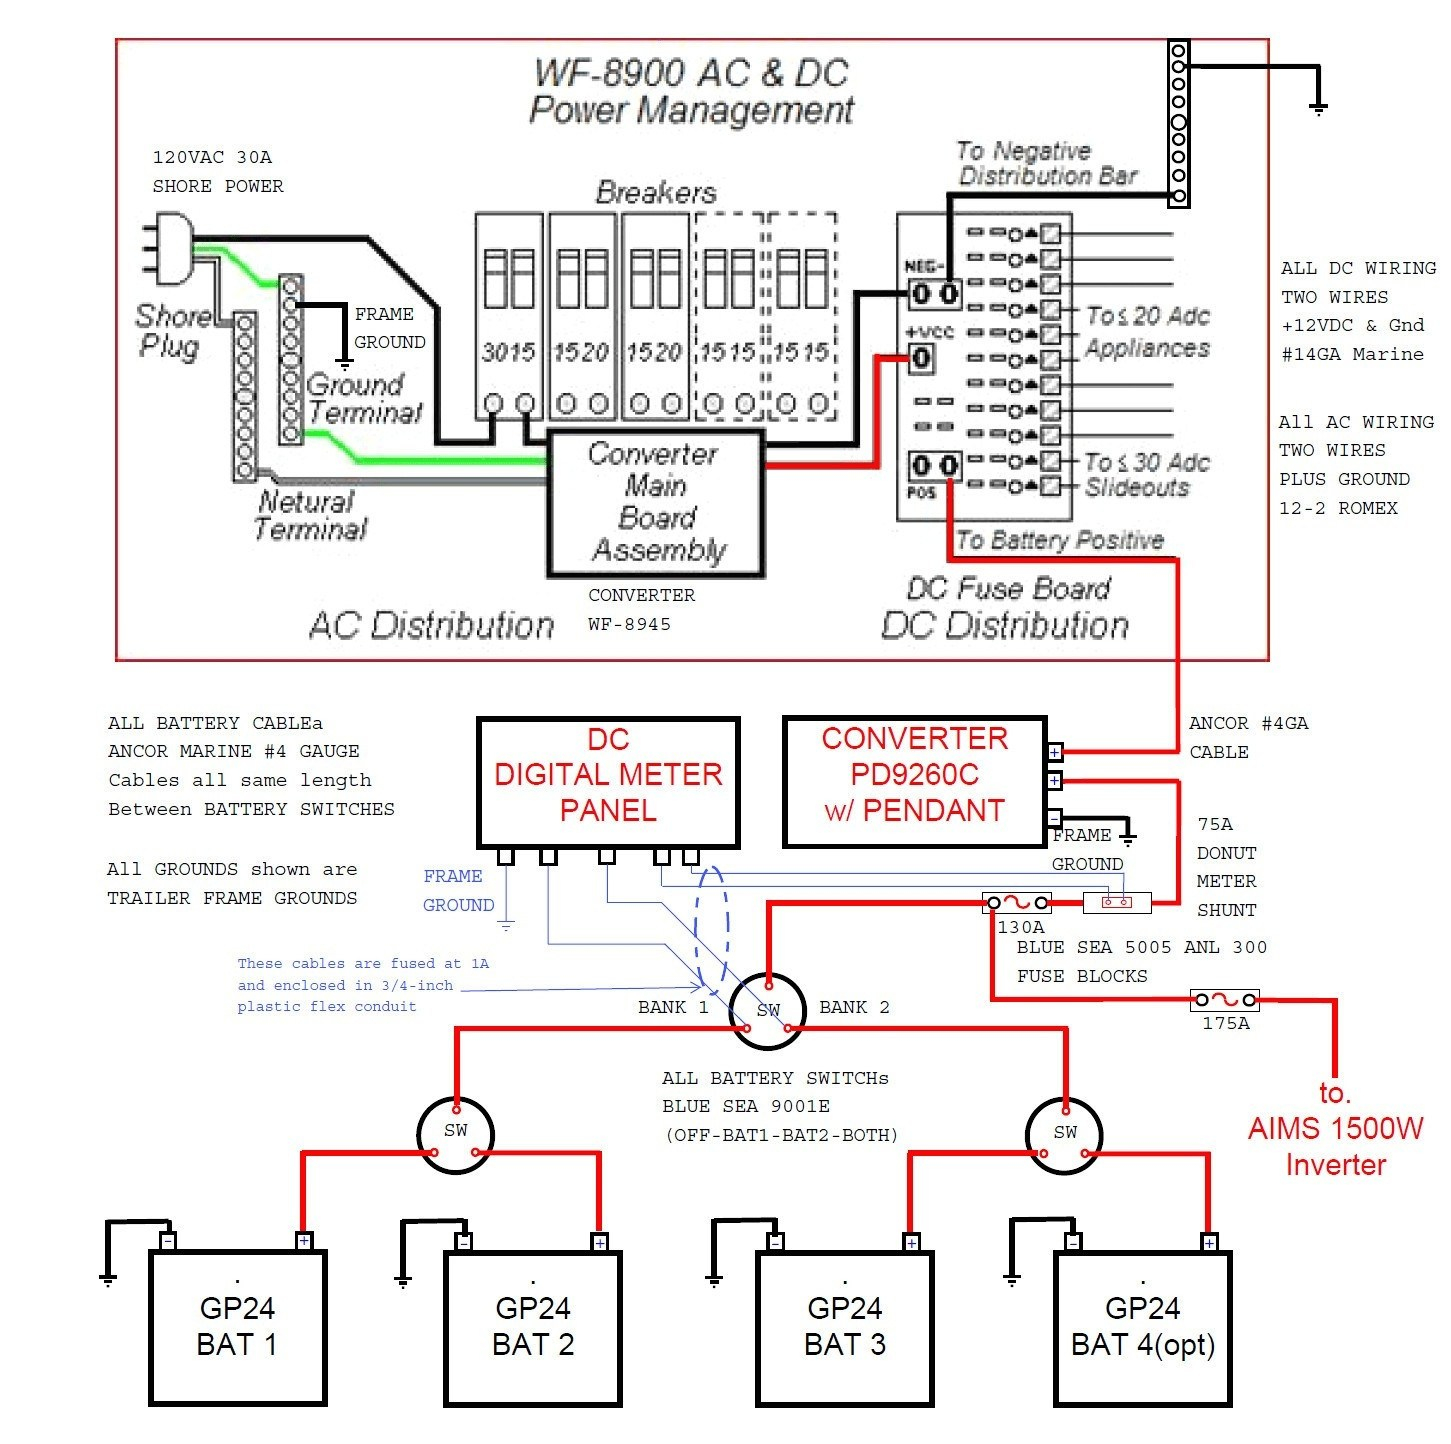 Jayco Wiring Harness - Wiring Diagram Detailed - Jayco Trailer Wiring Diagram